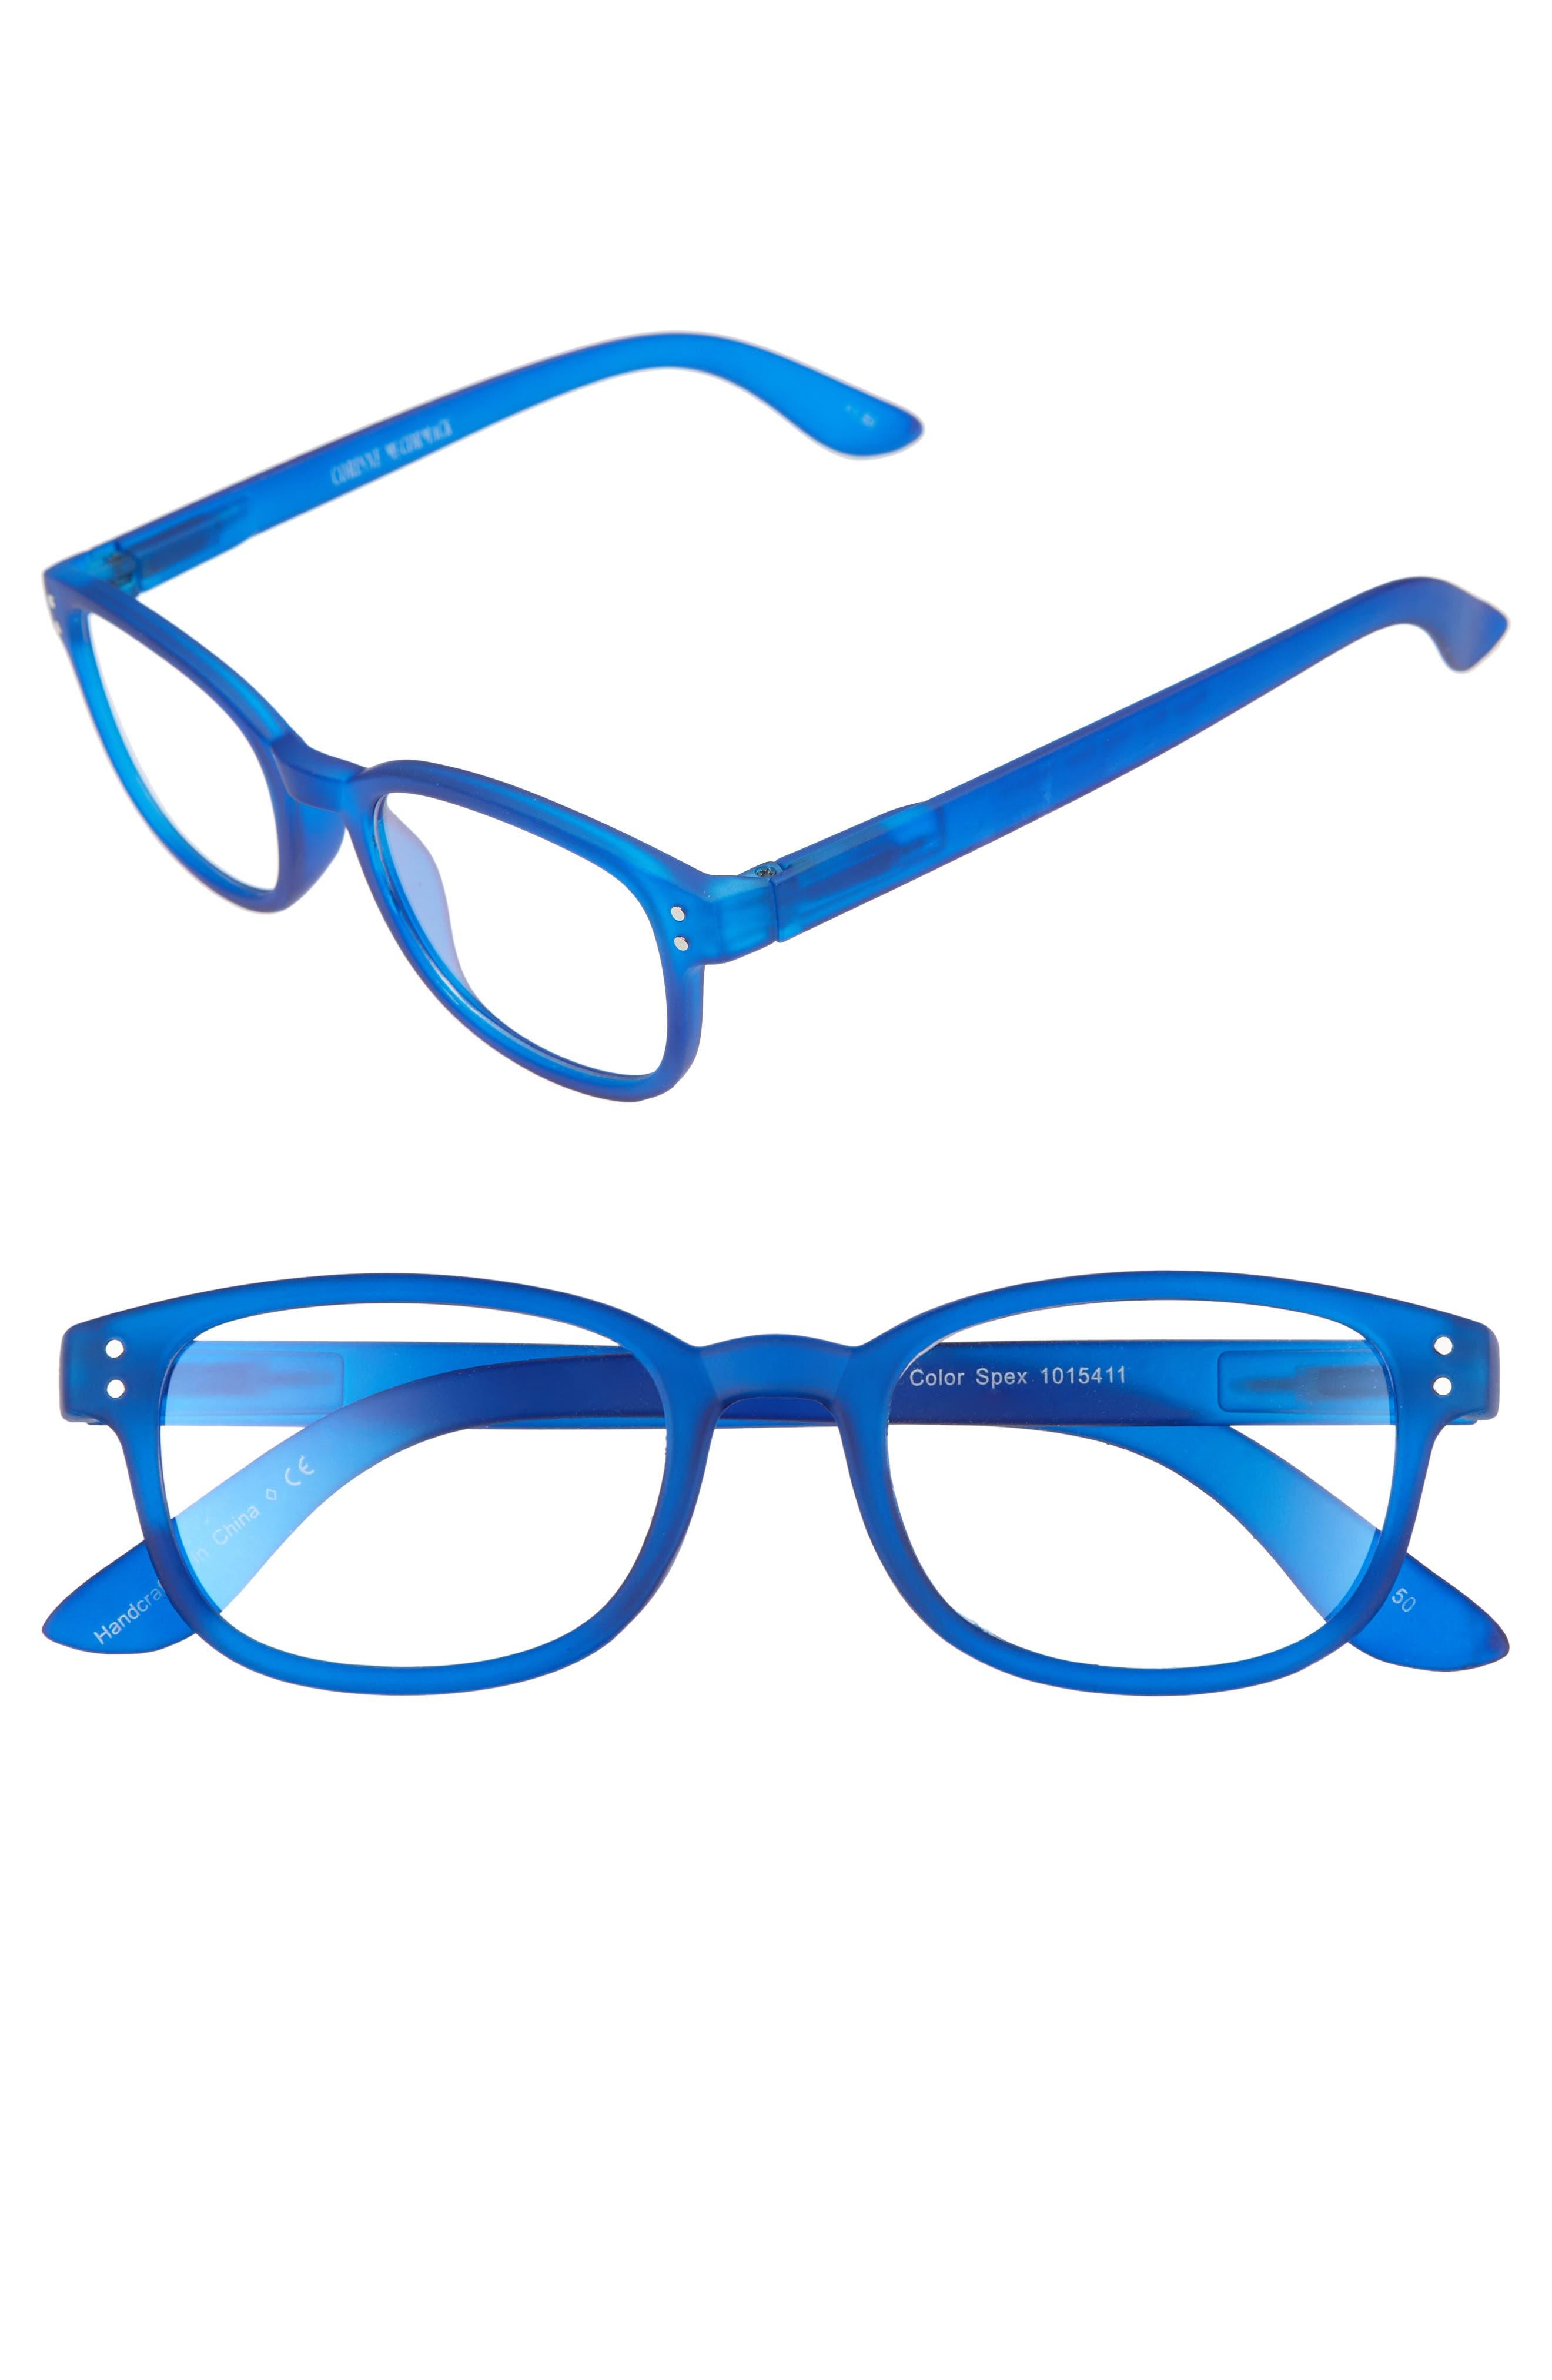 ColorSpex<sup>®</sup> 50mm Blue Light Blocking Reading Glasses,                             Main thumbnail 1, color,                             BLUE